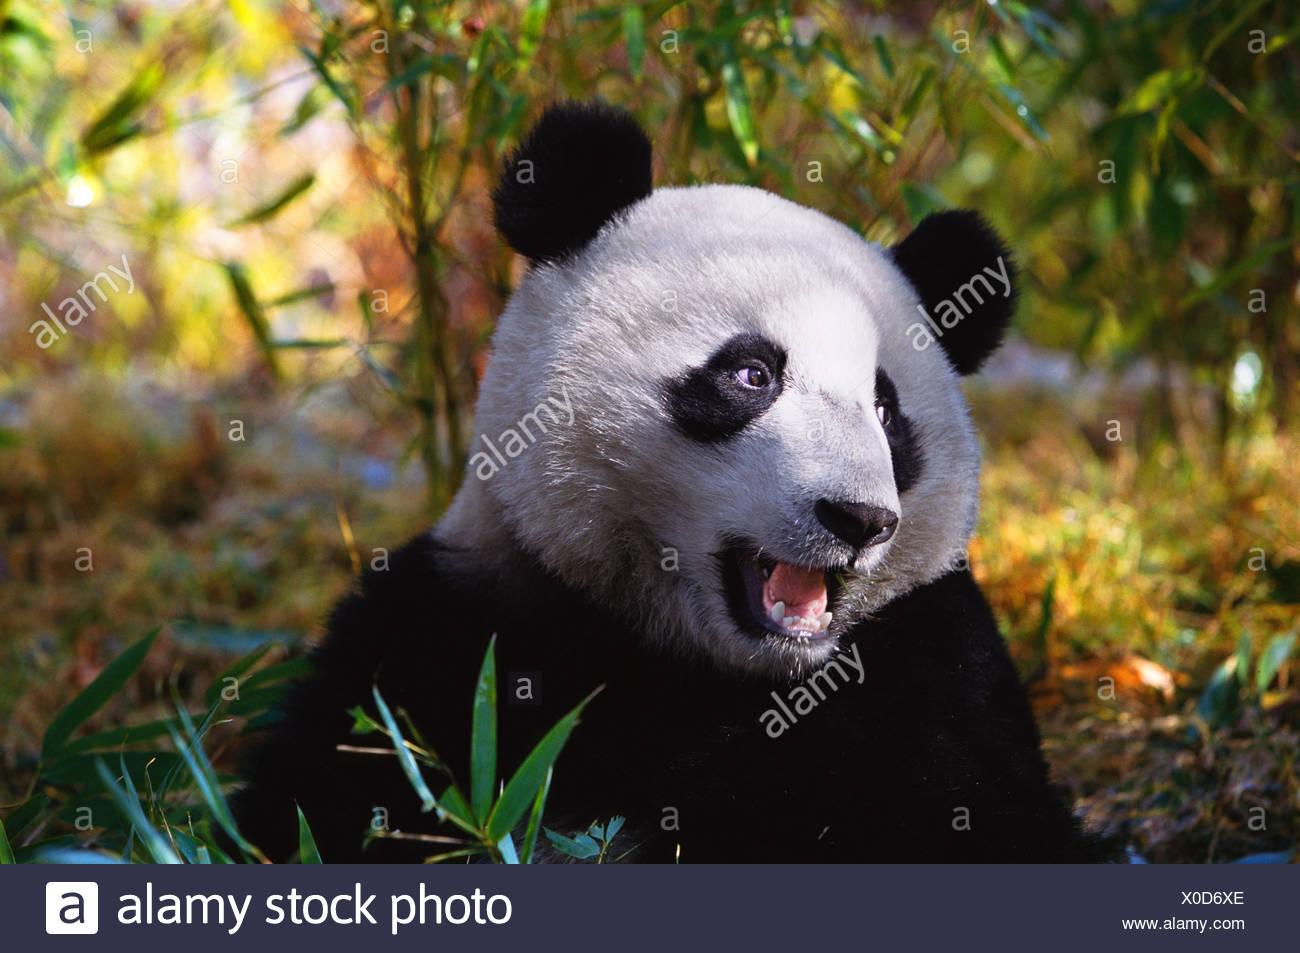 Giant panda Sichuan China - Stock Image